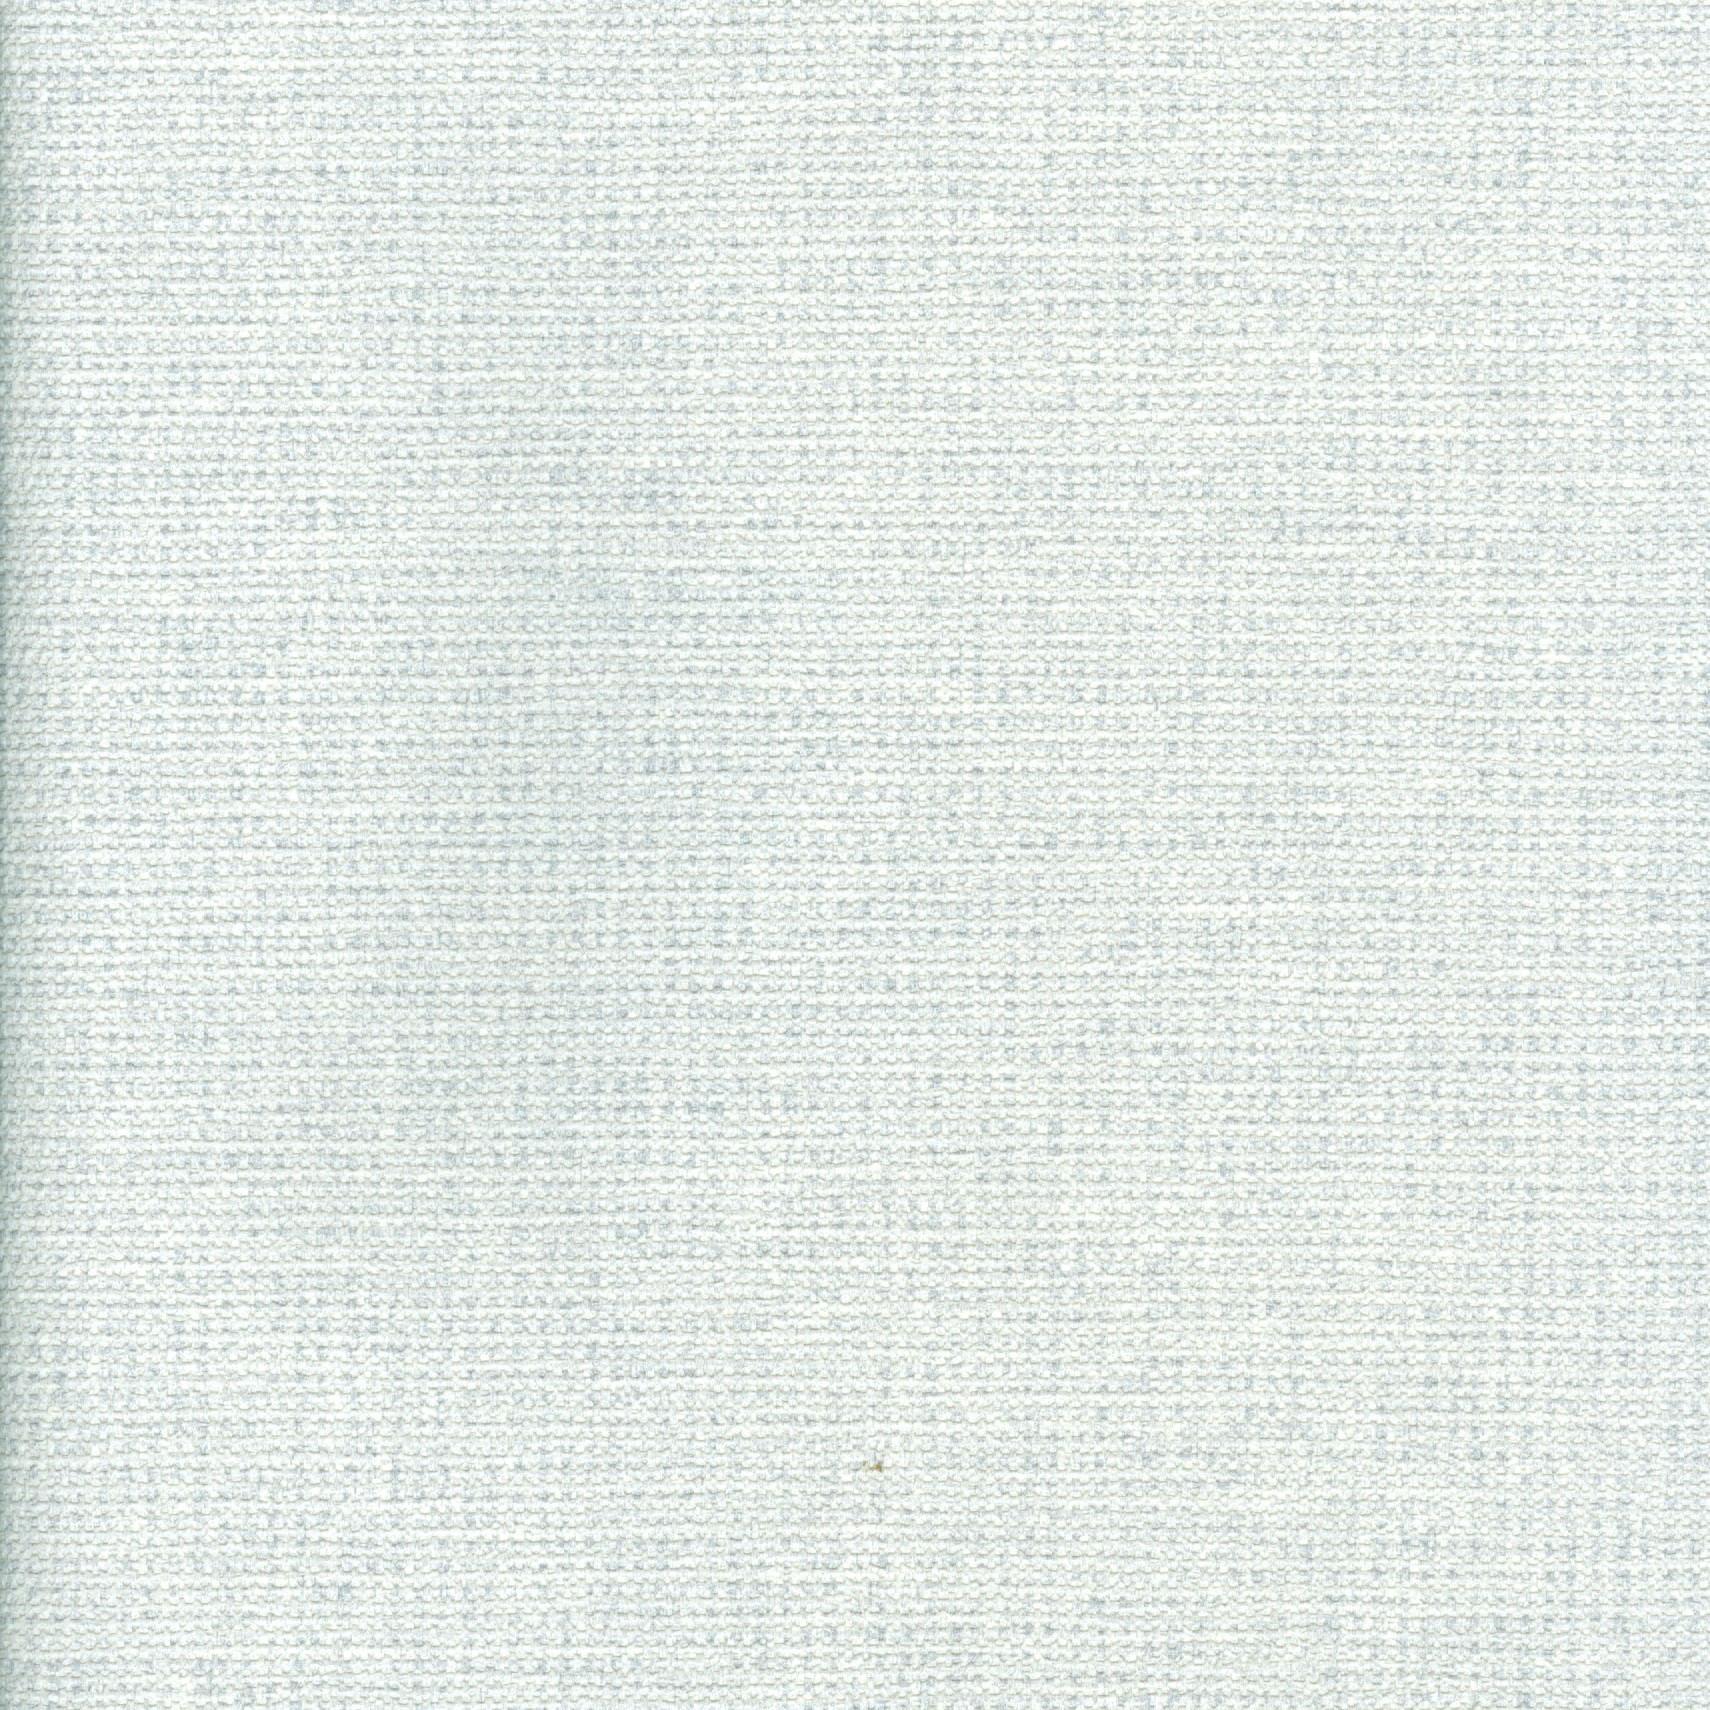 Papel de Parede Pure 2 Tramado 187502 - Rolo: 10m x 0,53m